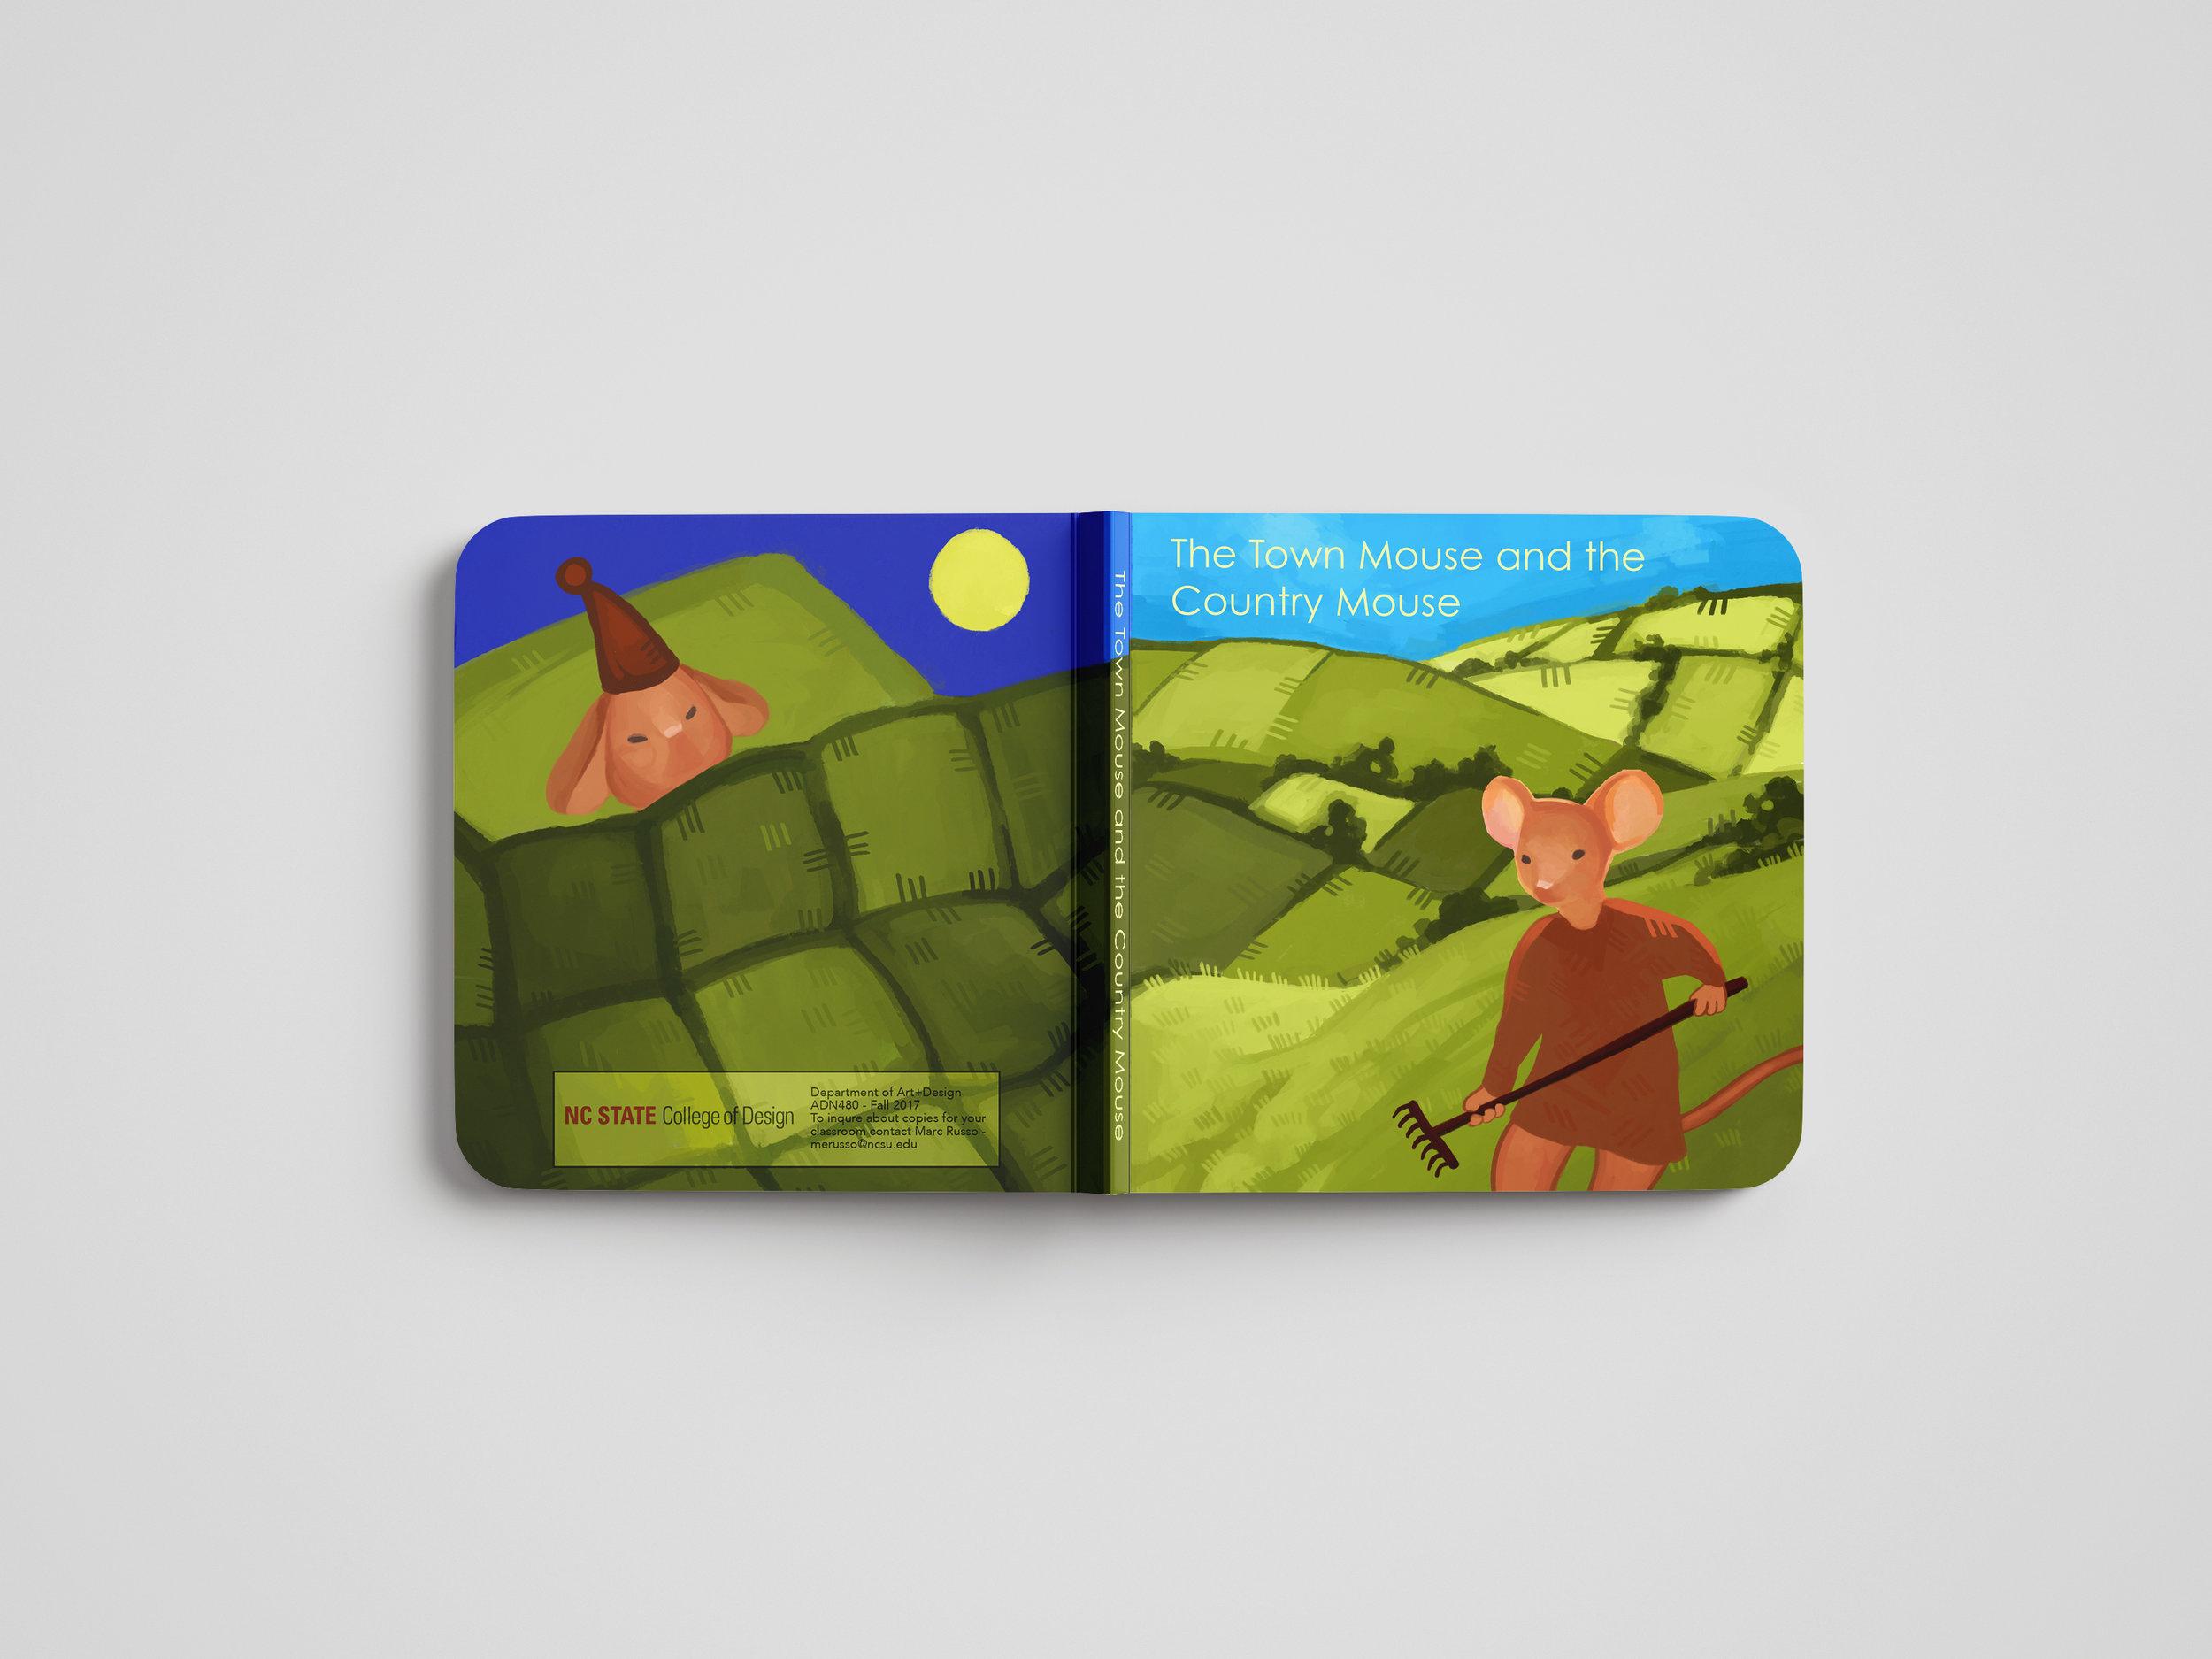 Childrens_Book_Mockup_6 copy.jpg